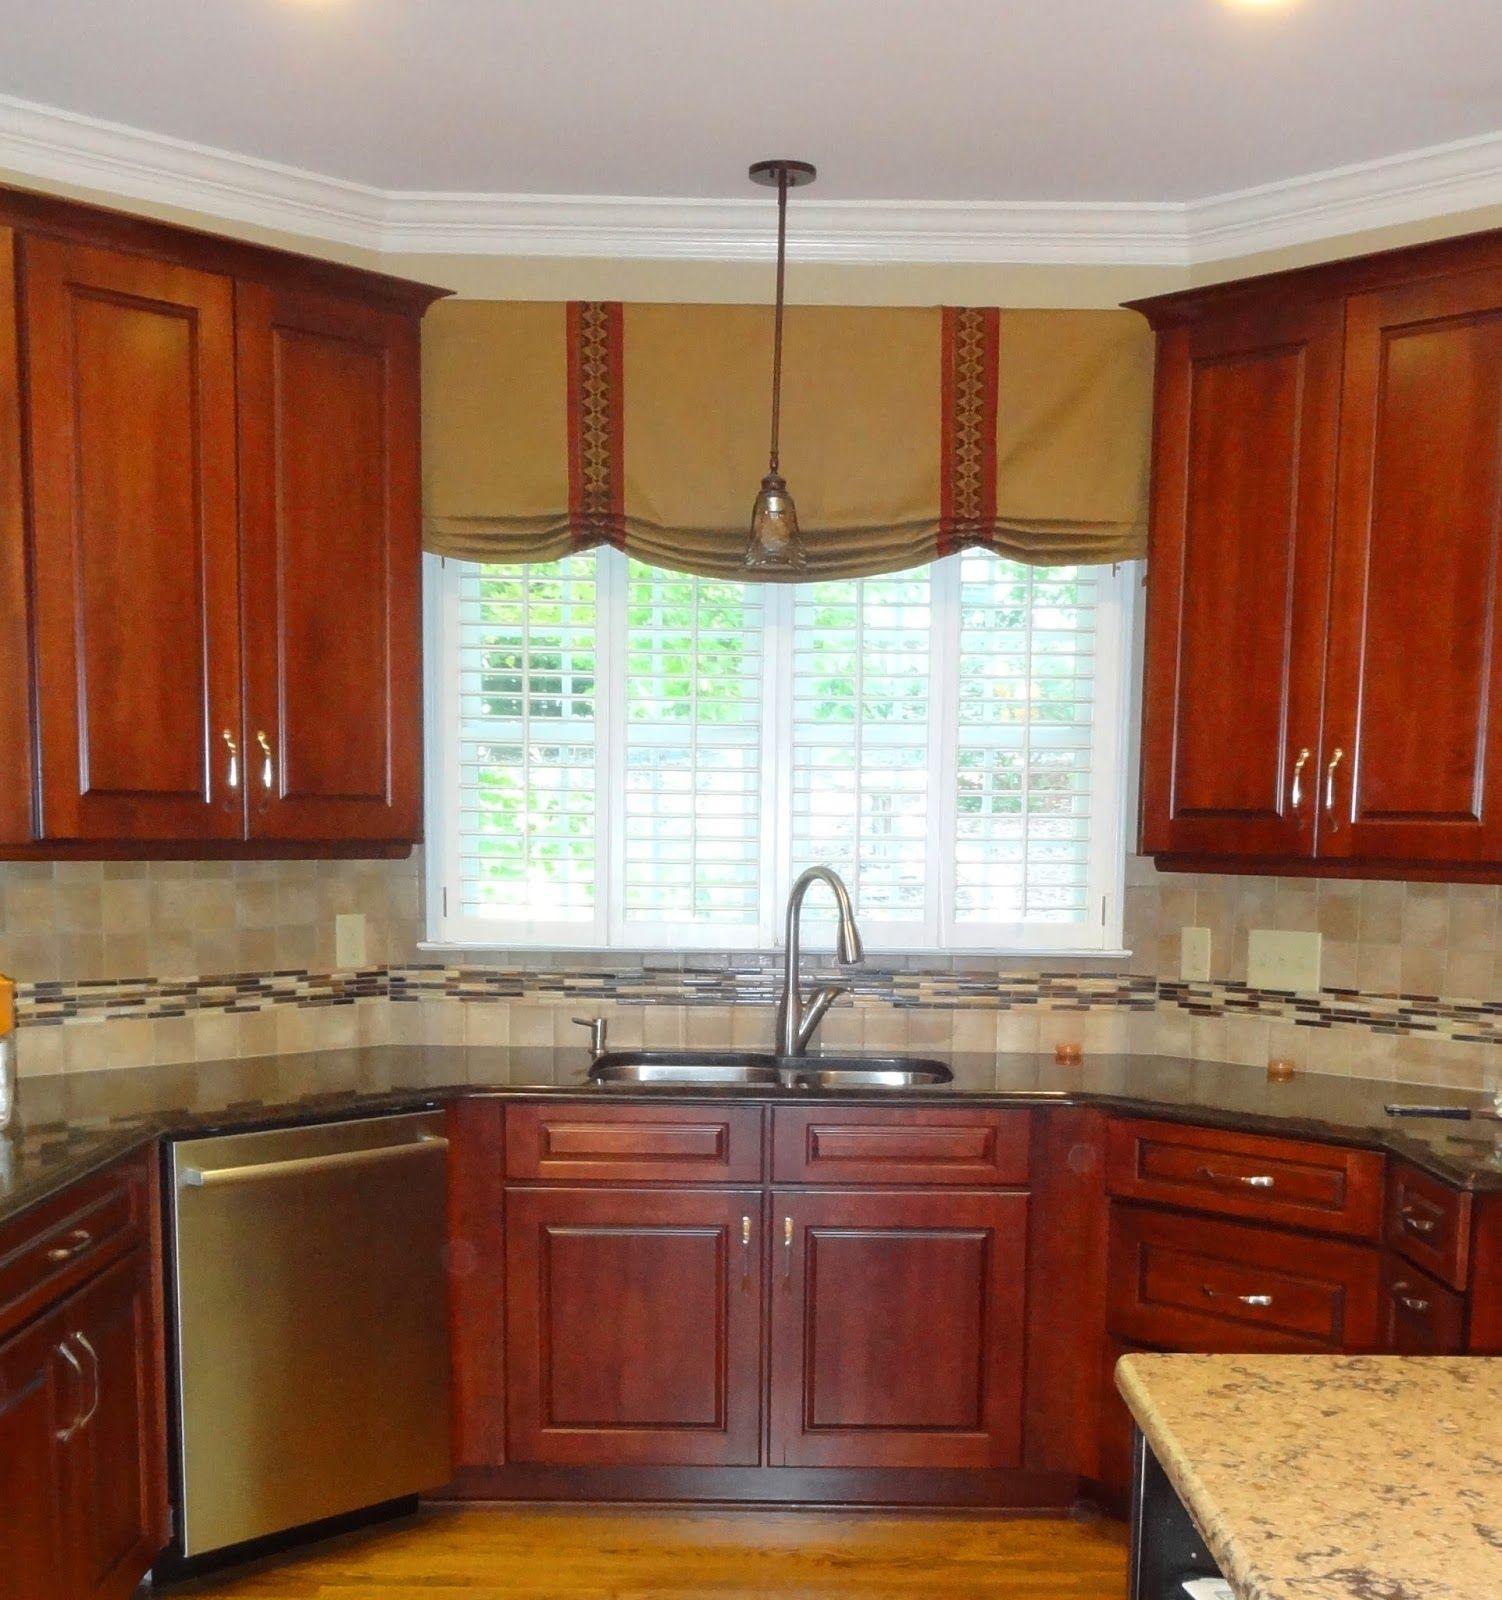 Kitchen window treatment ideas  the  best images about kitchen window treatments on pinterest